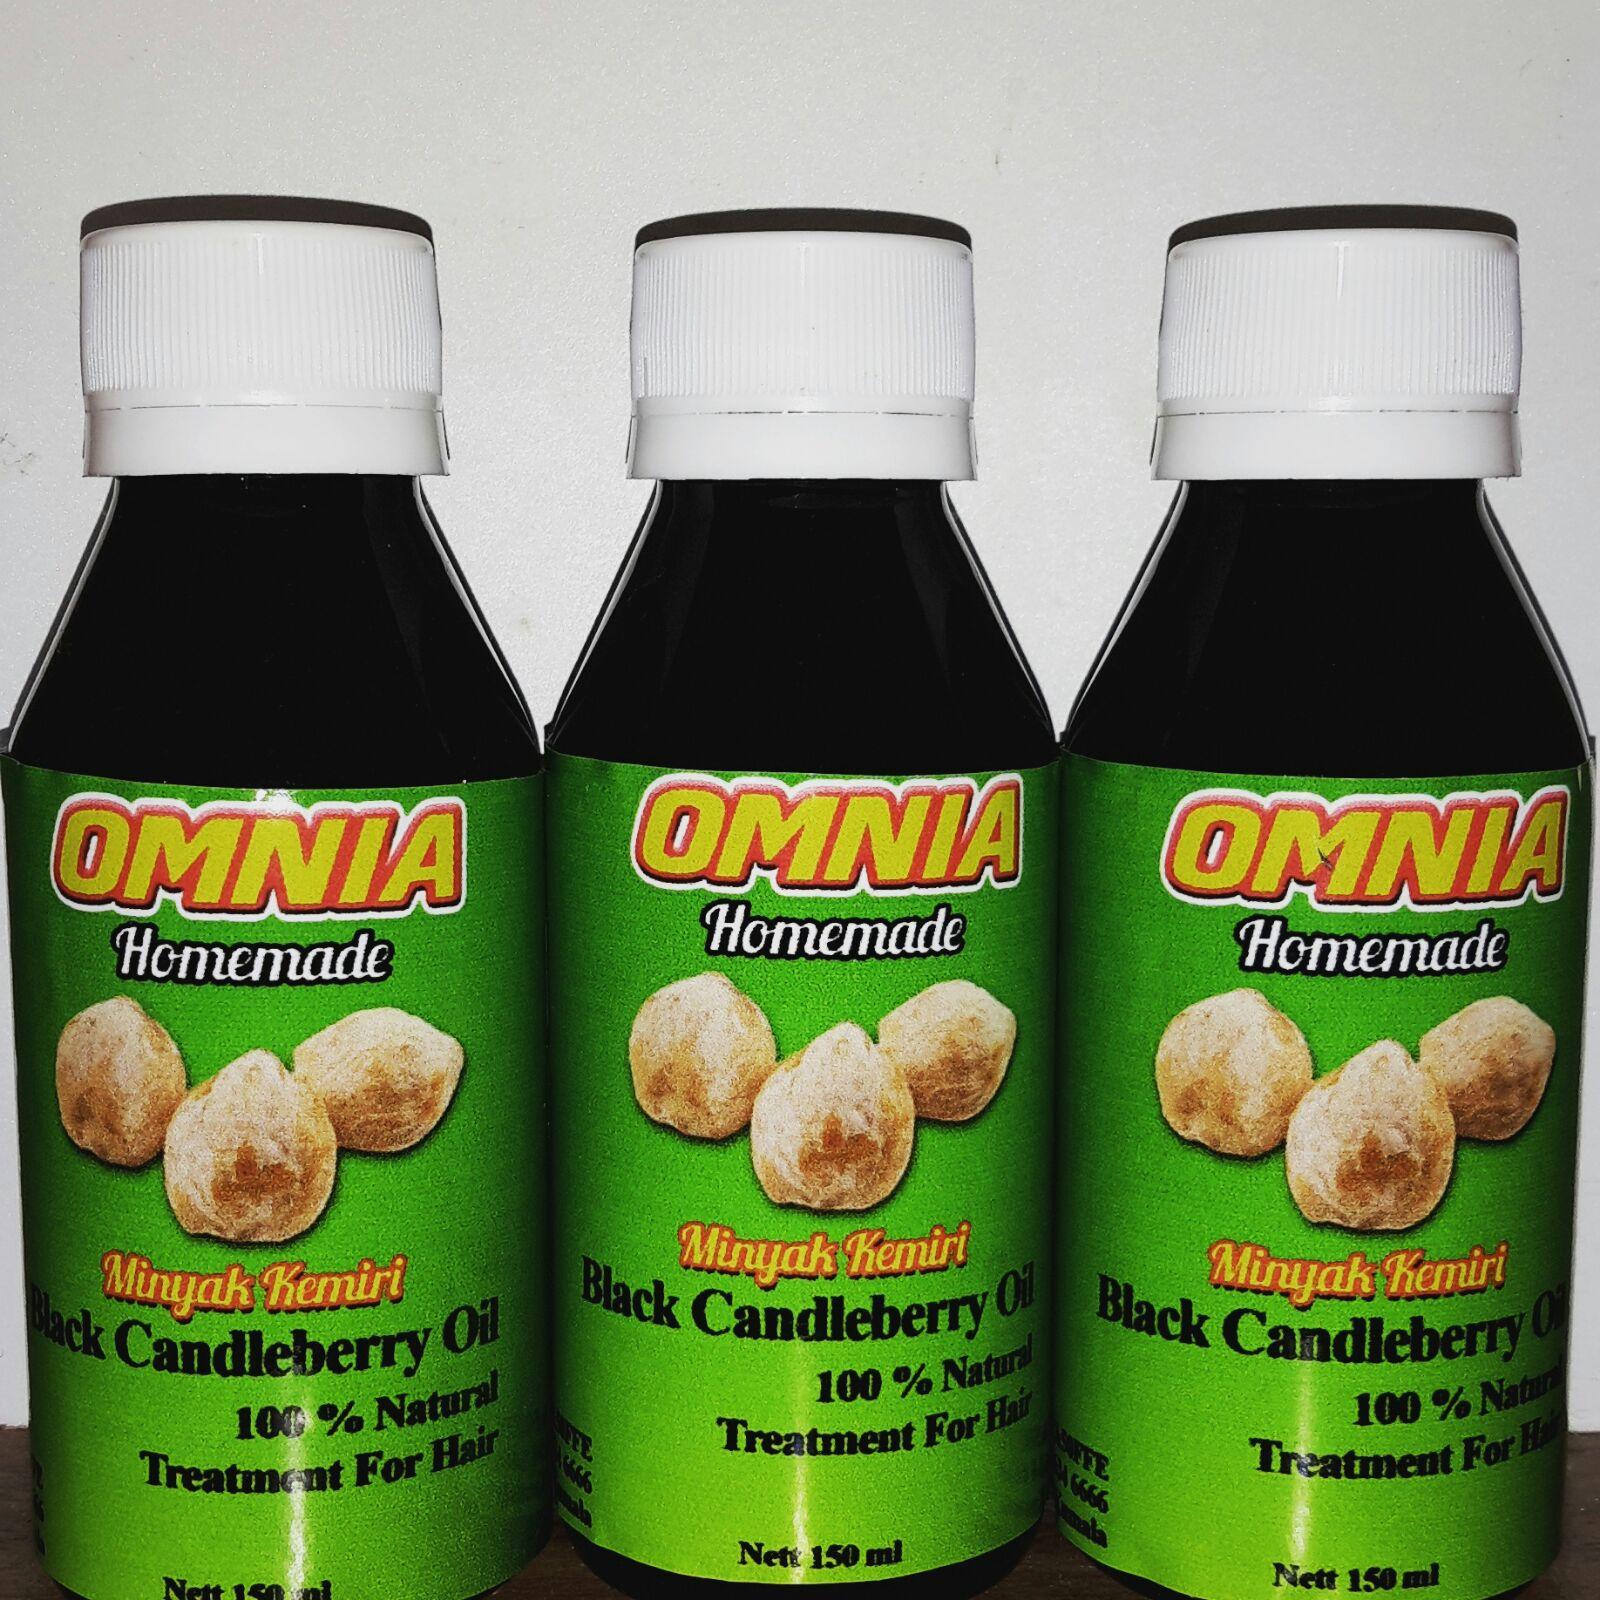 jual minyak kemiri asli - black - pekanbaru di indonesia | katalog.or.id Gambar Minyak Kemiri Yang Asli